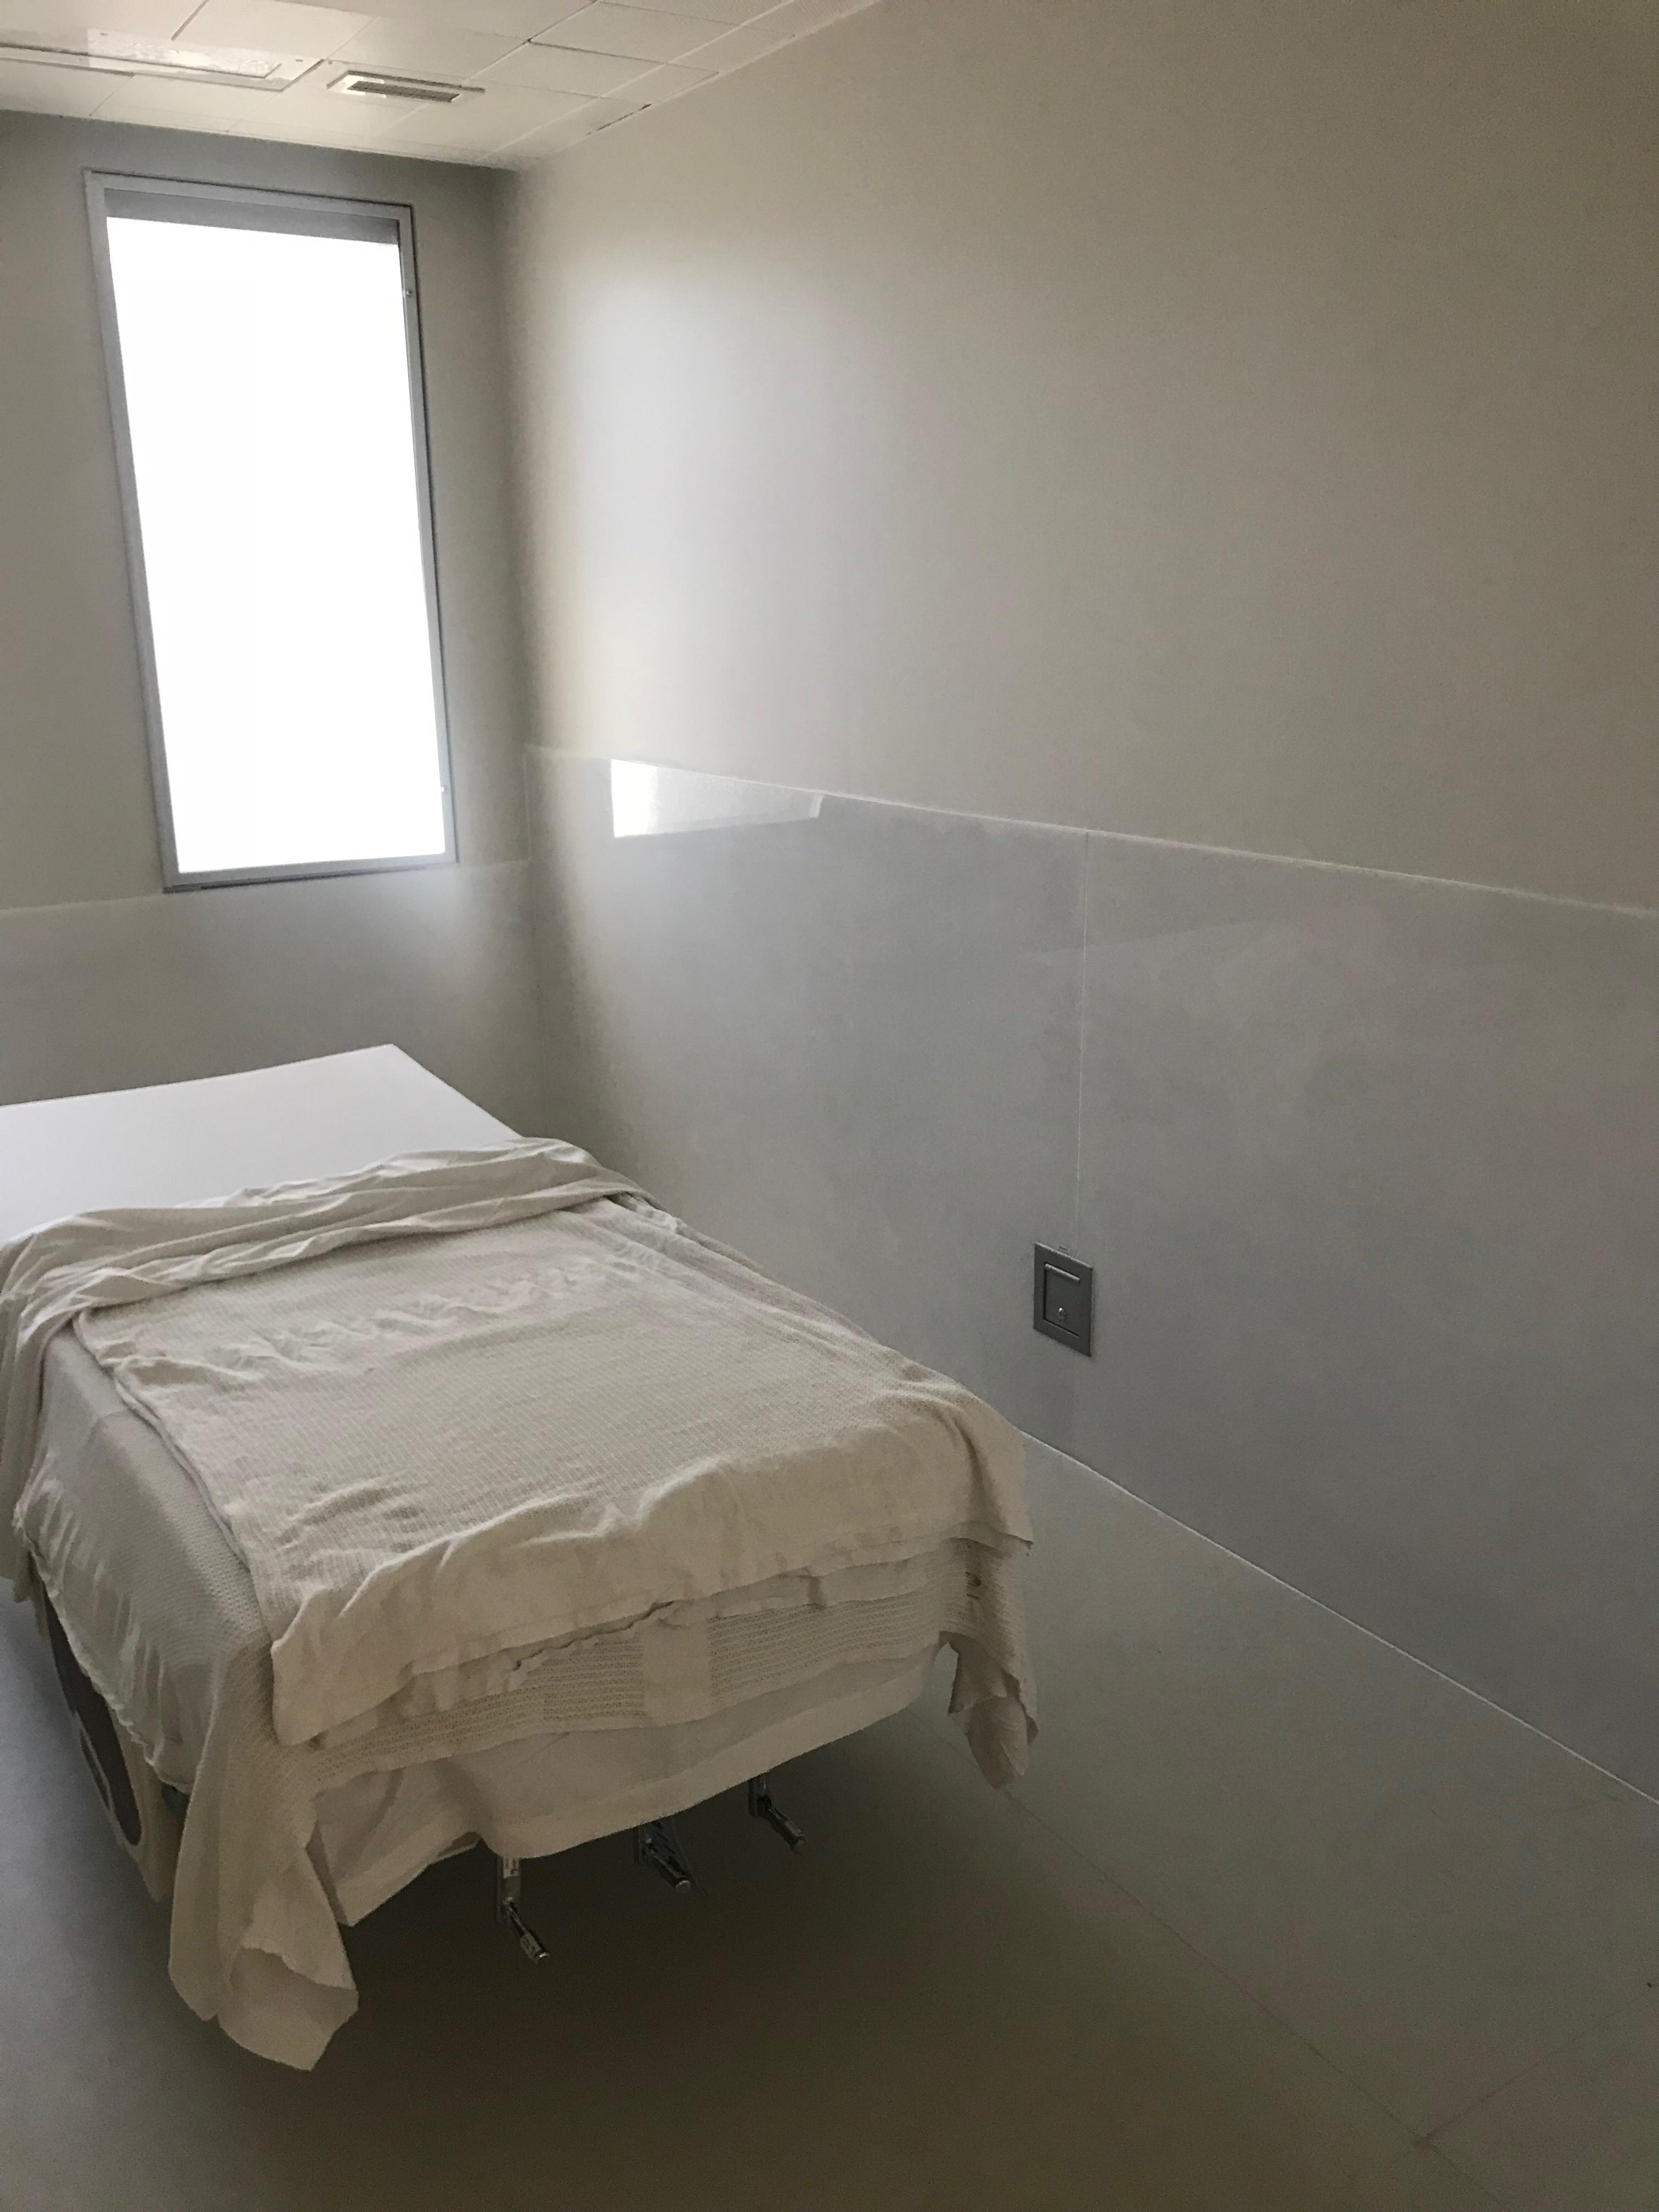 Hospital Room 2